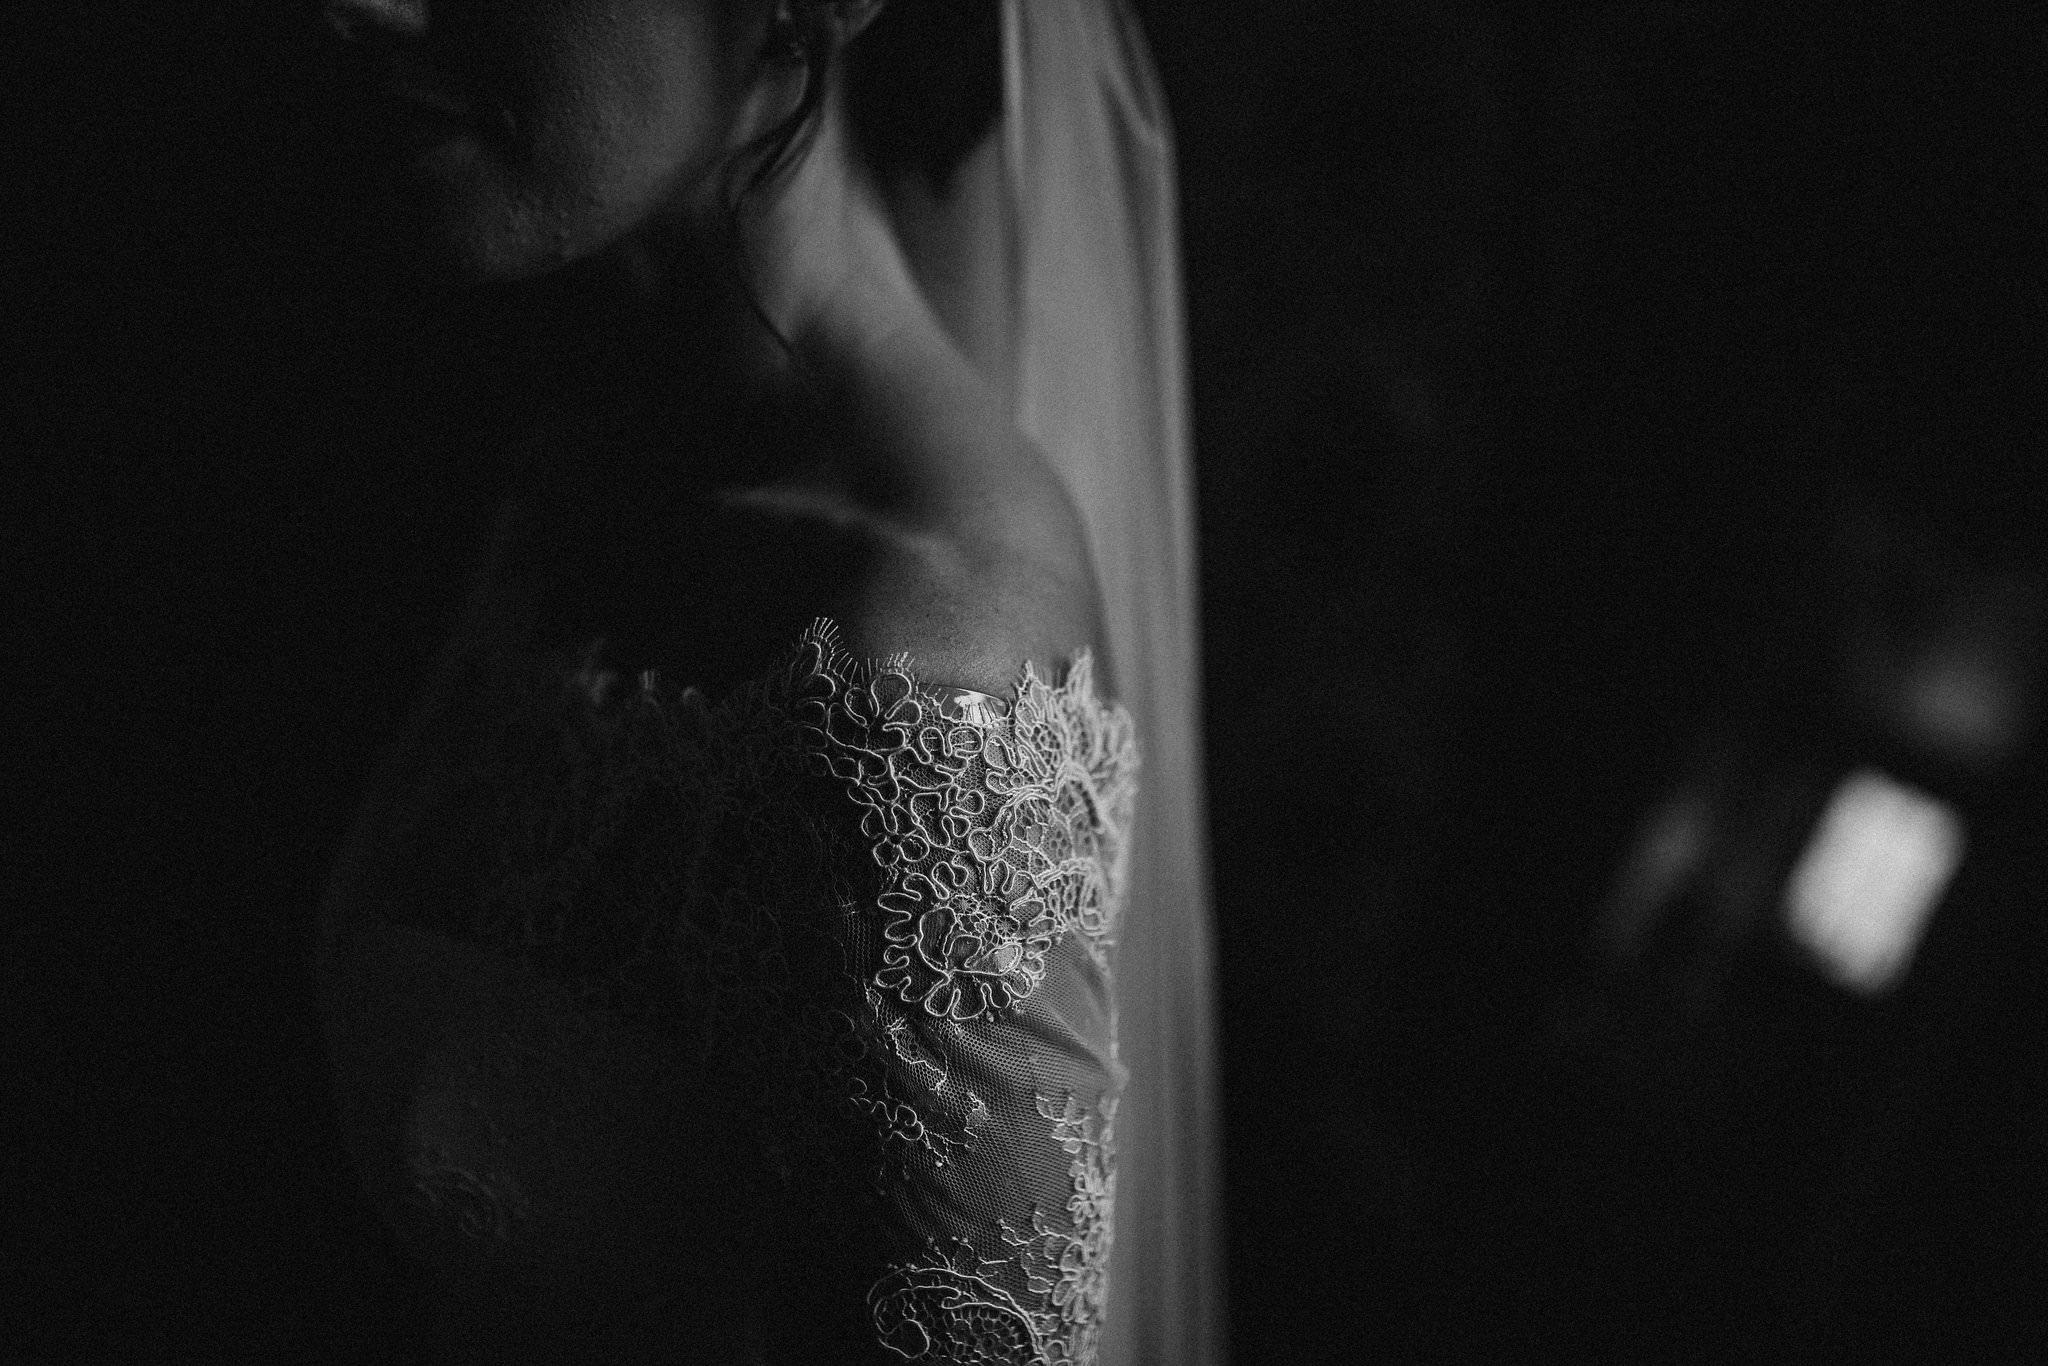 kirknewton stables wedding photographer (20).jpg